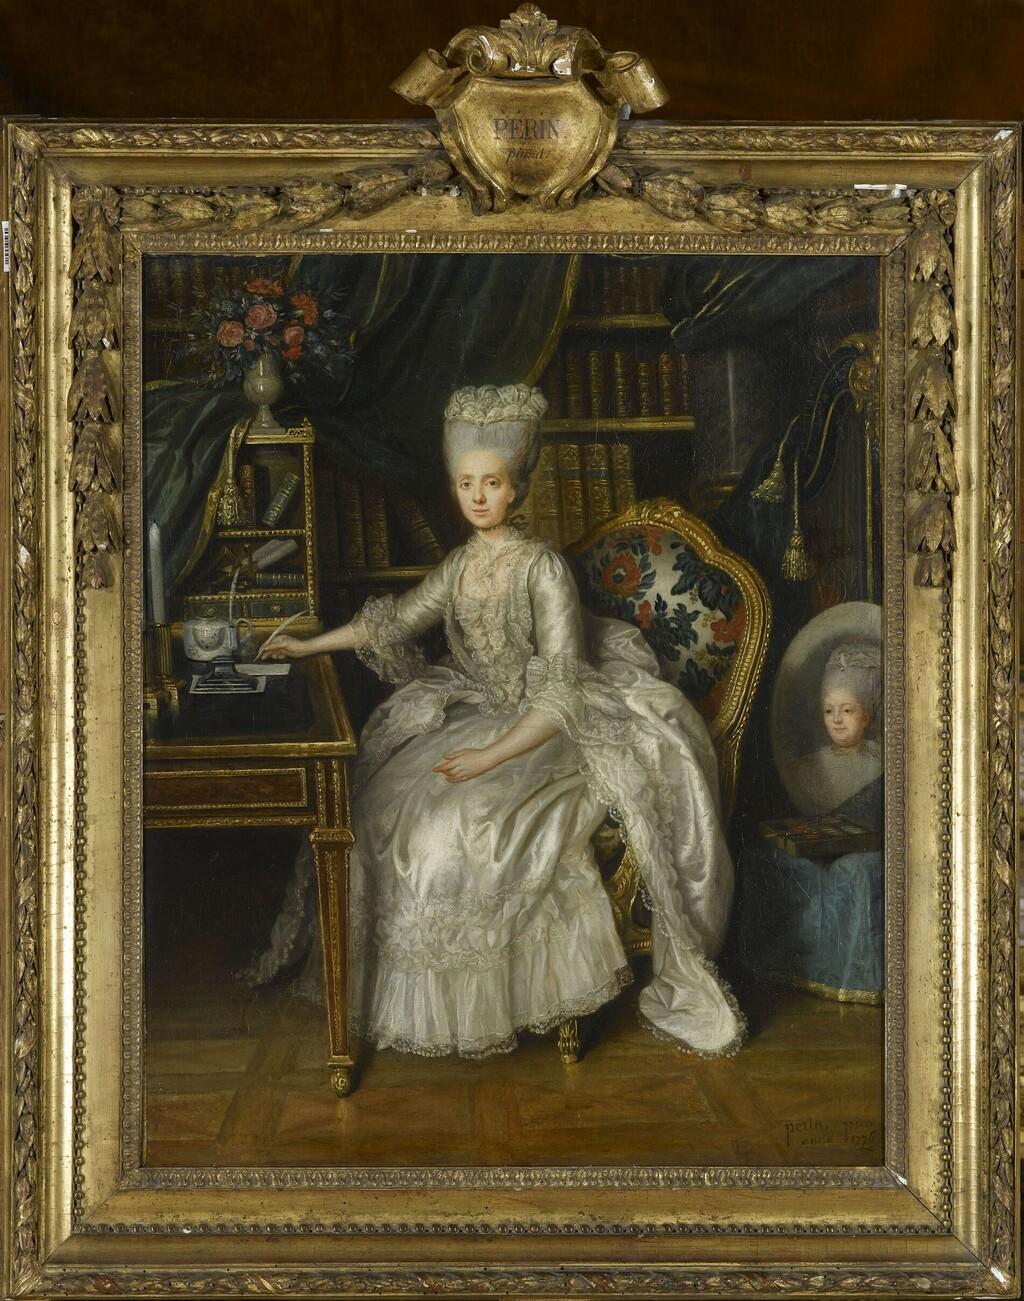 Marie-Adélaïde de France, dite Madame Adélaïde - Page 3 Madame43